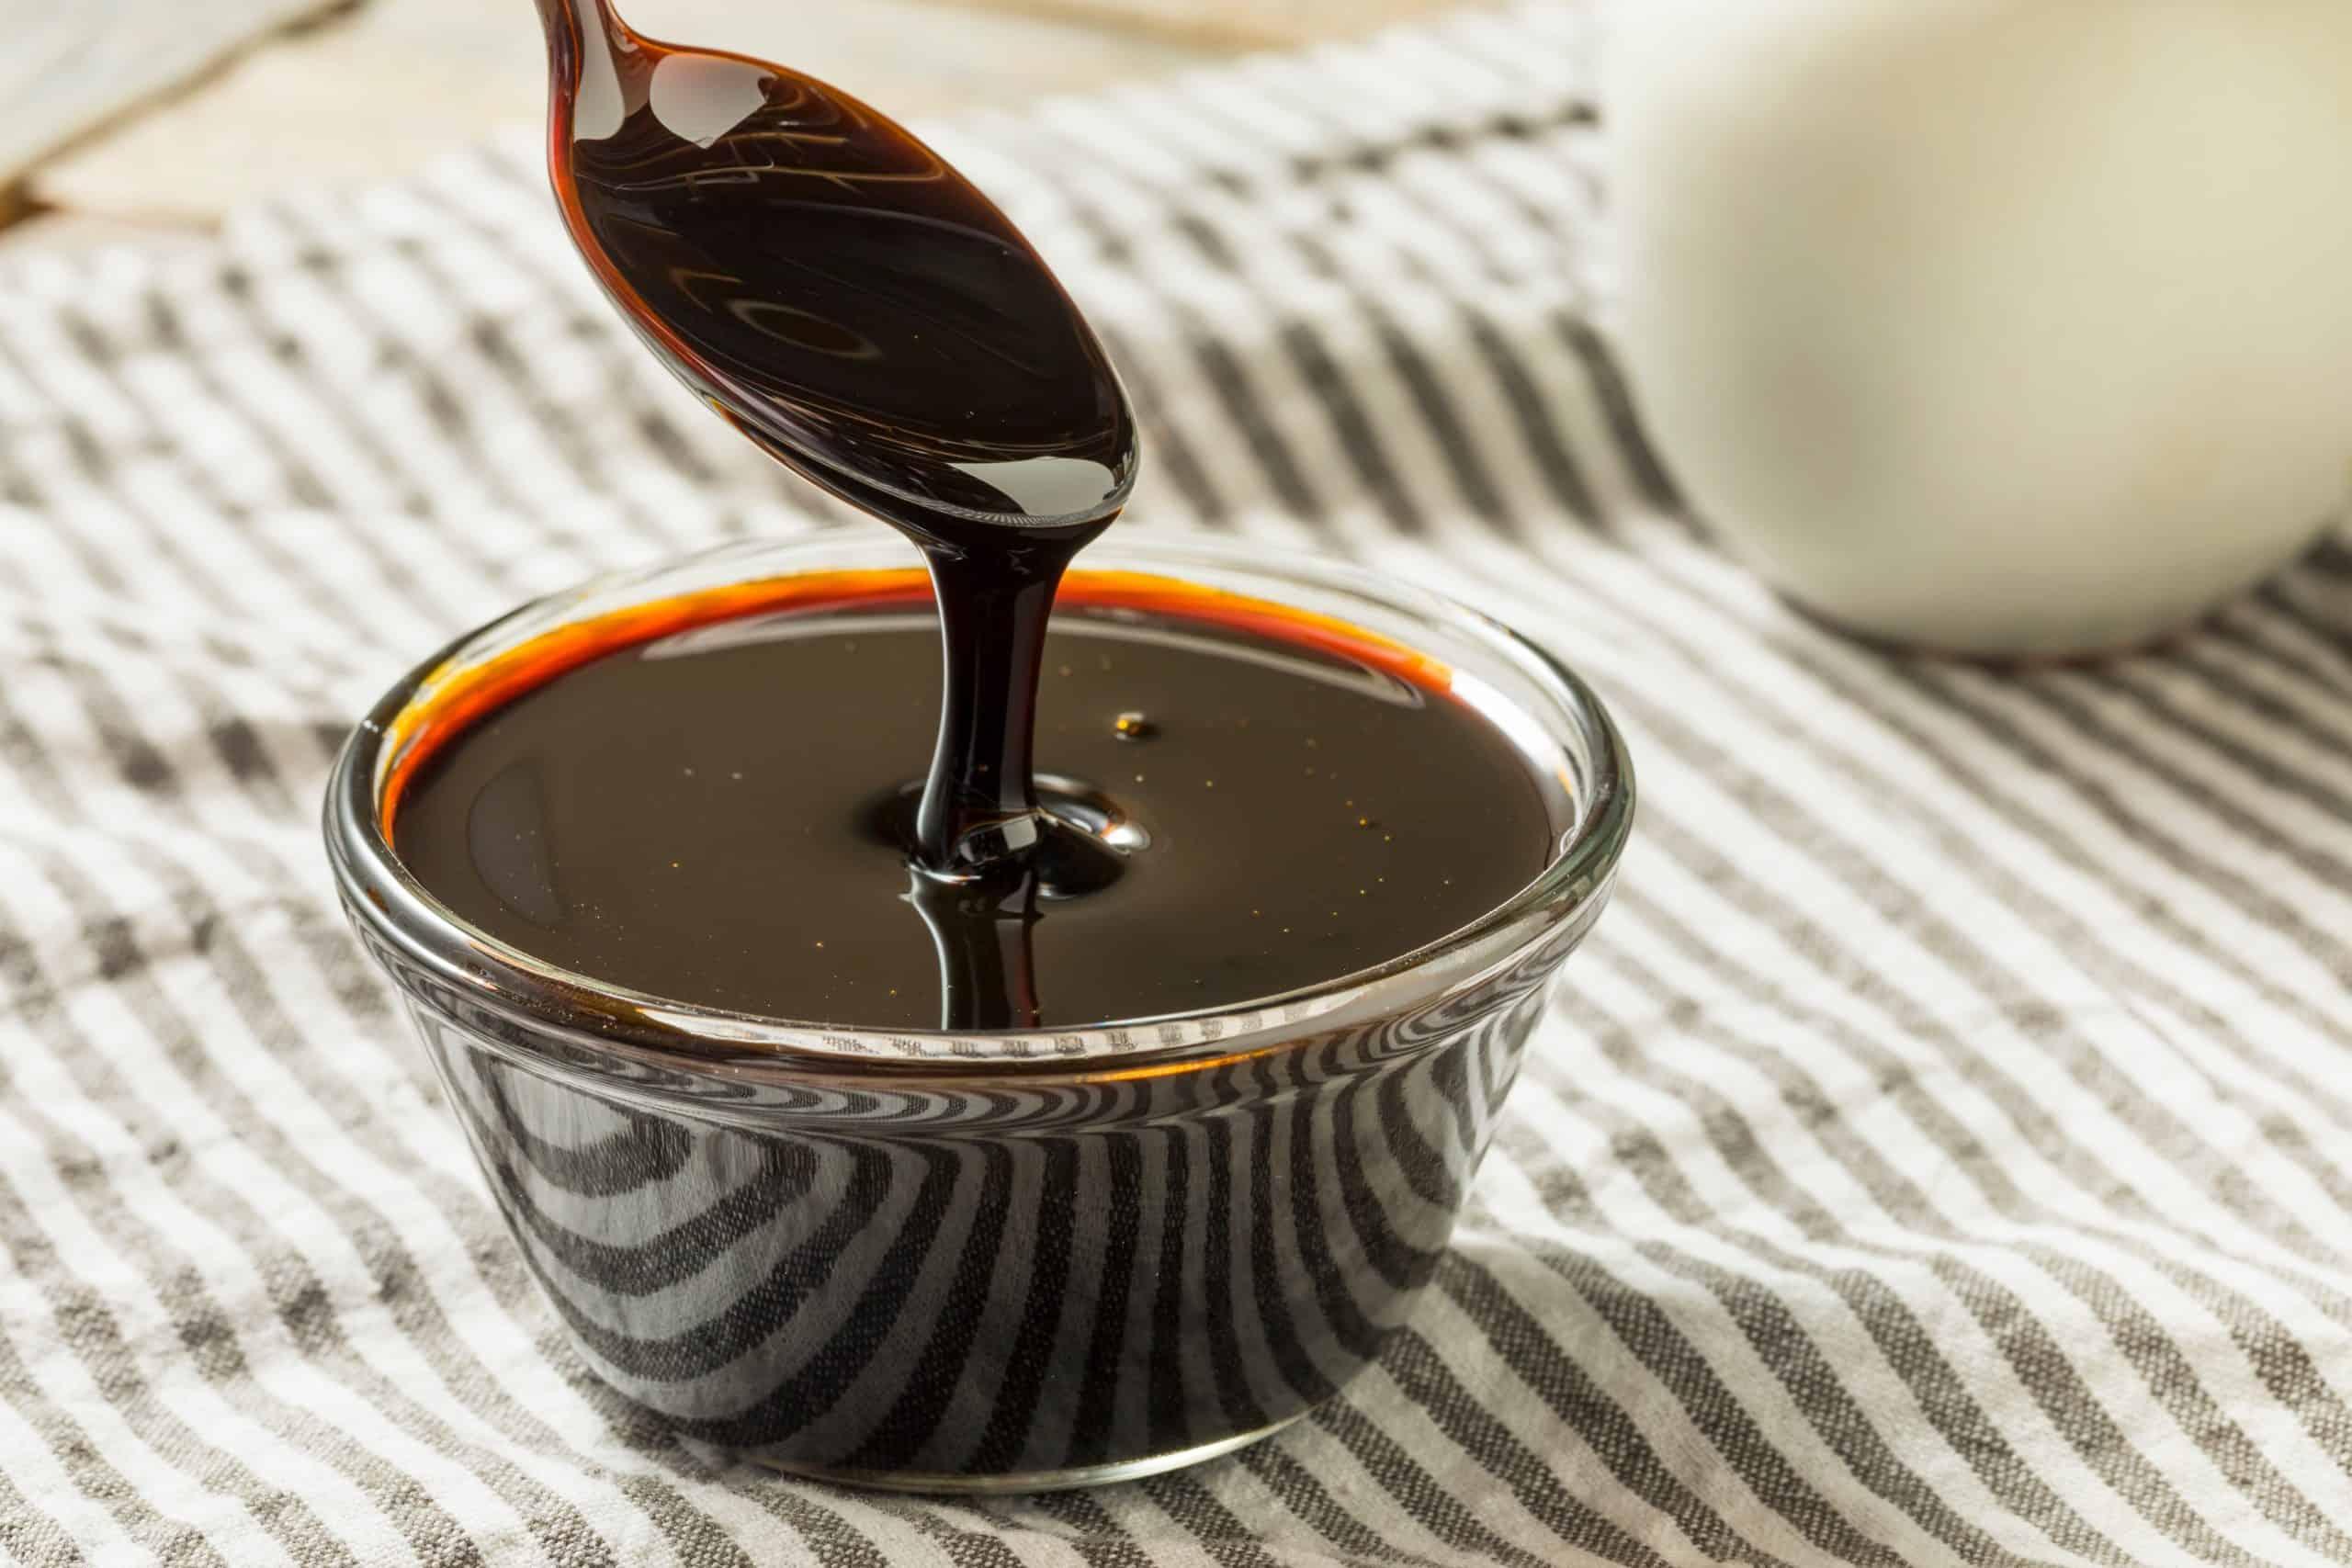 Organic Black Cane Sugar Molasses in a Bowl